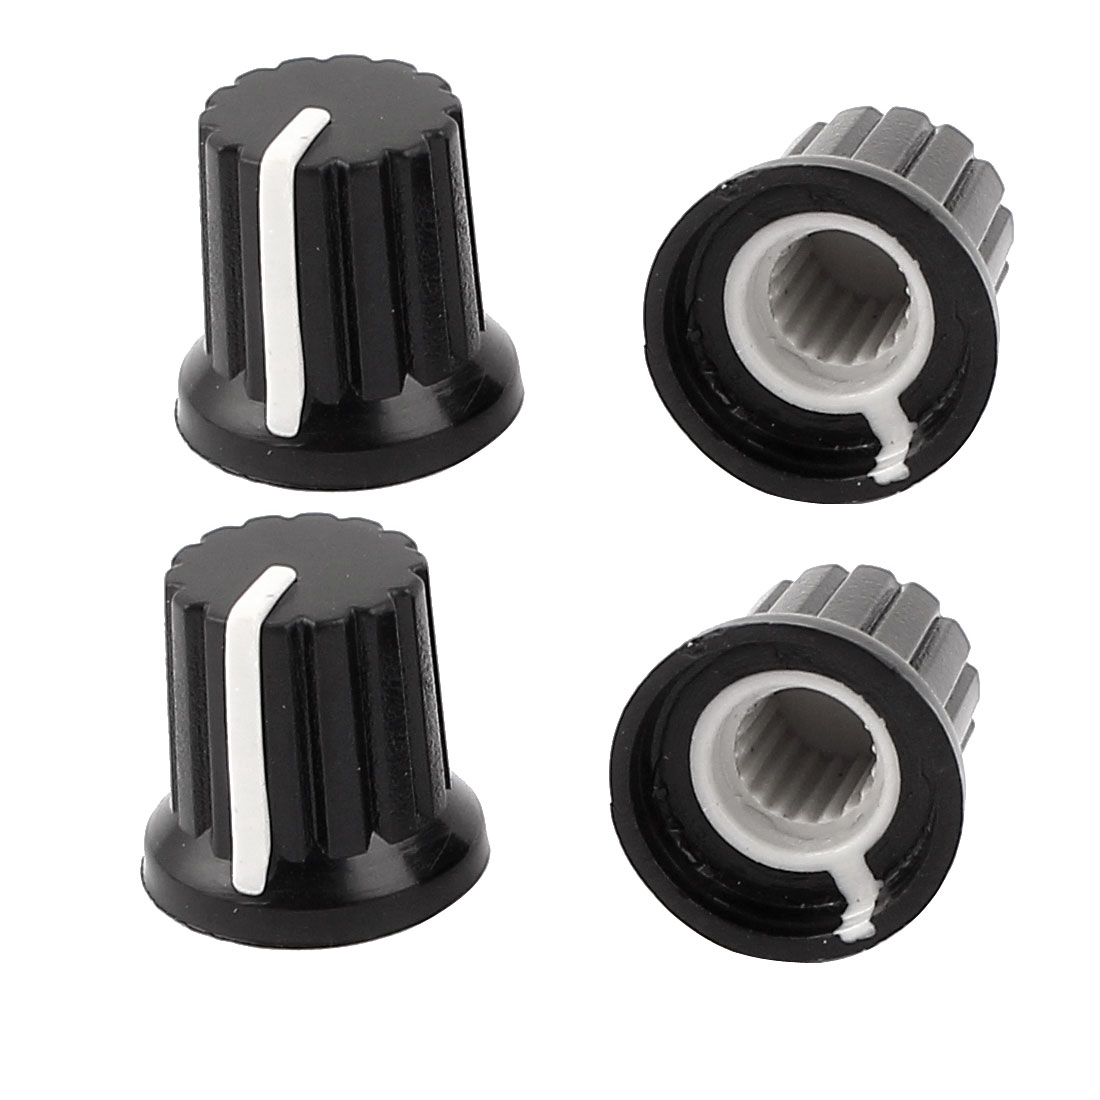 4Pcs Plastic 6mm Hole Dia Light Lamp Dimmer Control Rotary Knob Cap Black